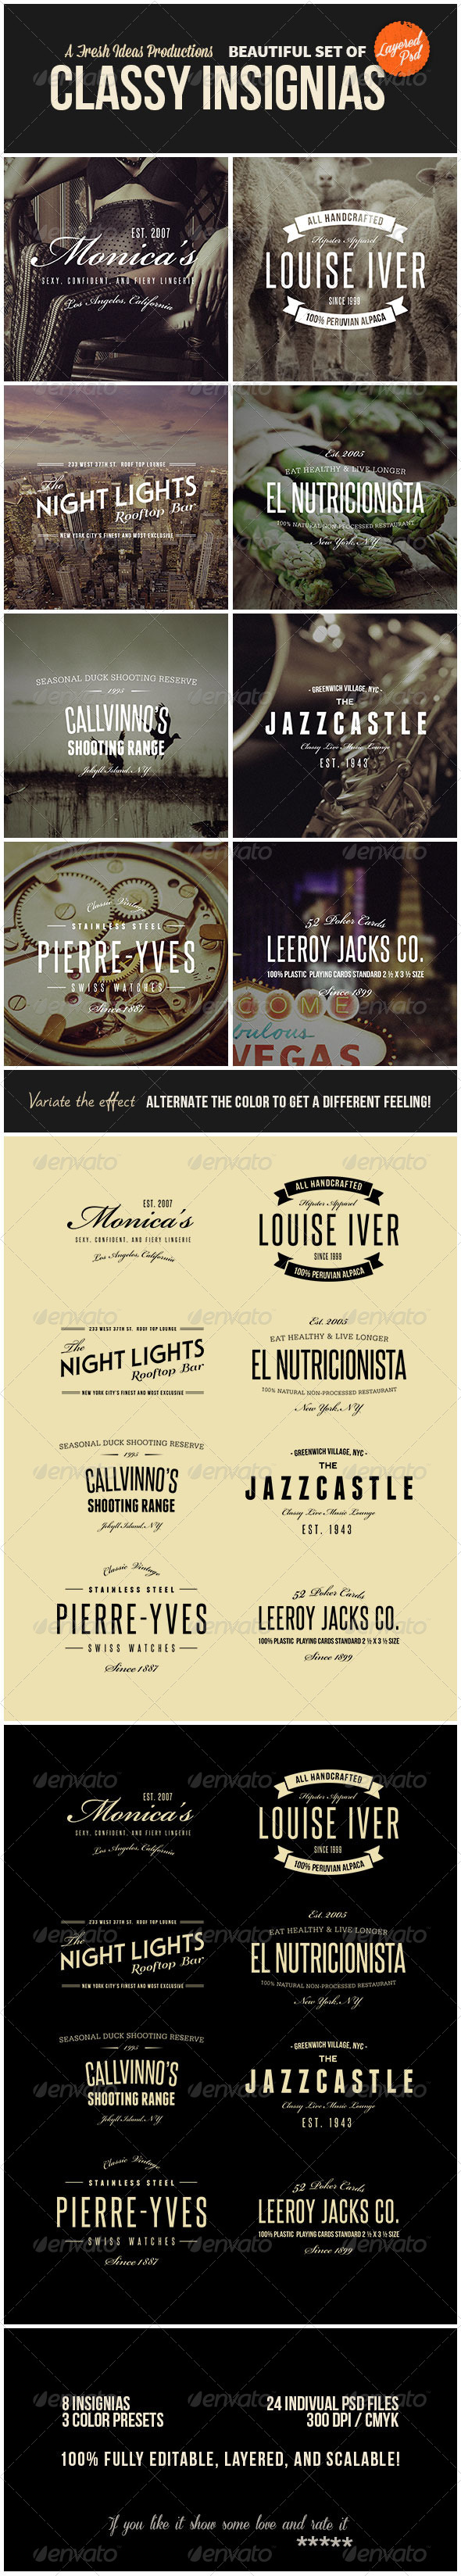 GraphicRiver 8 Classy Insignias Vol.2 7044197